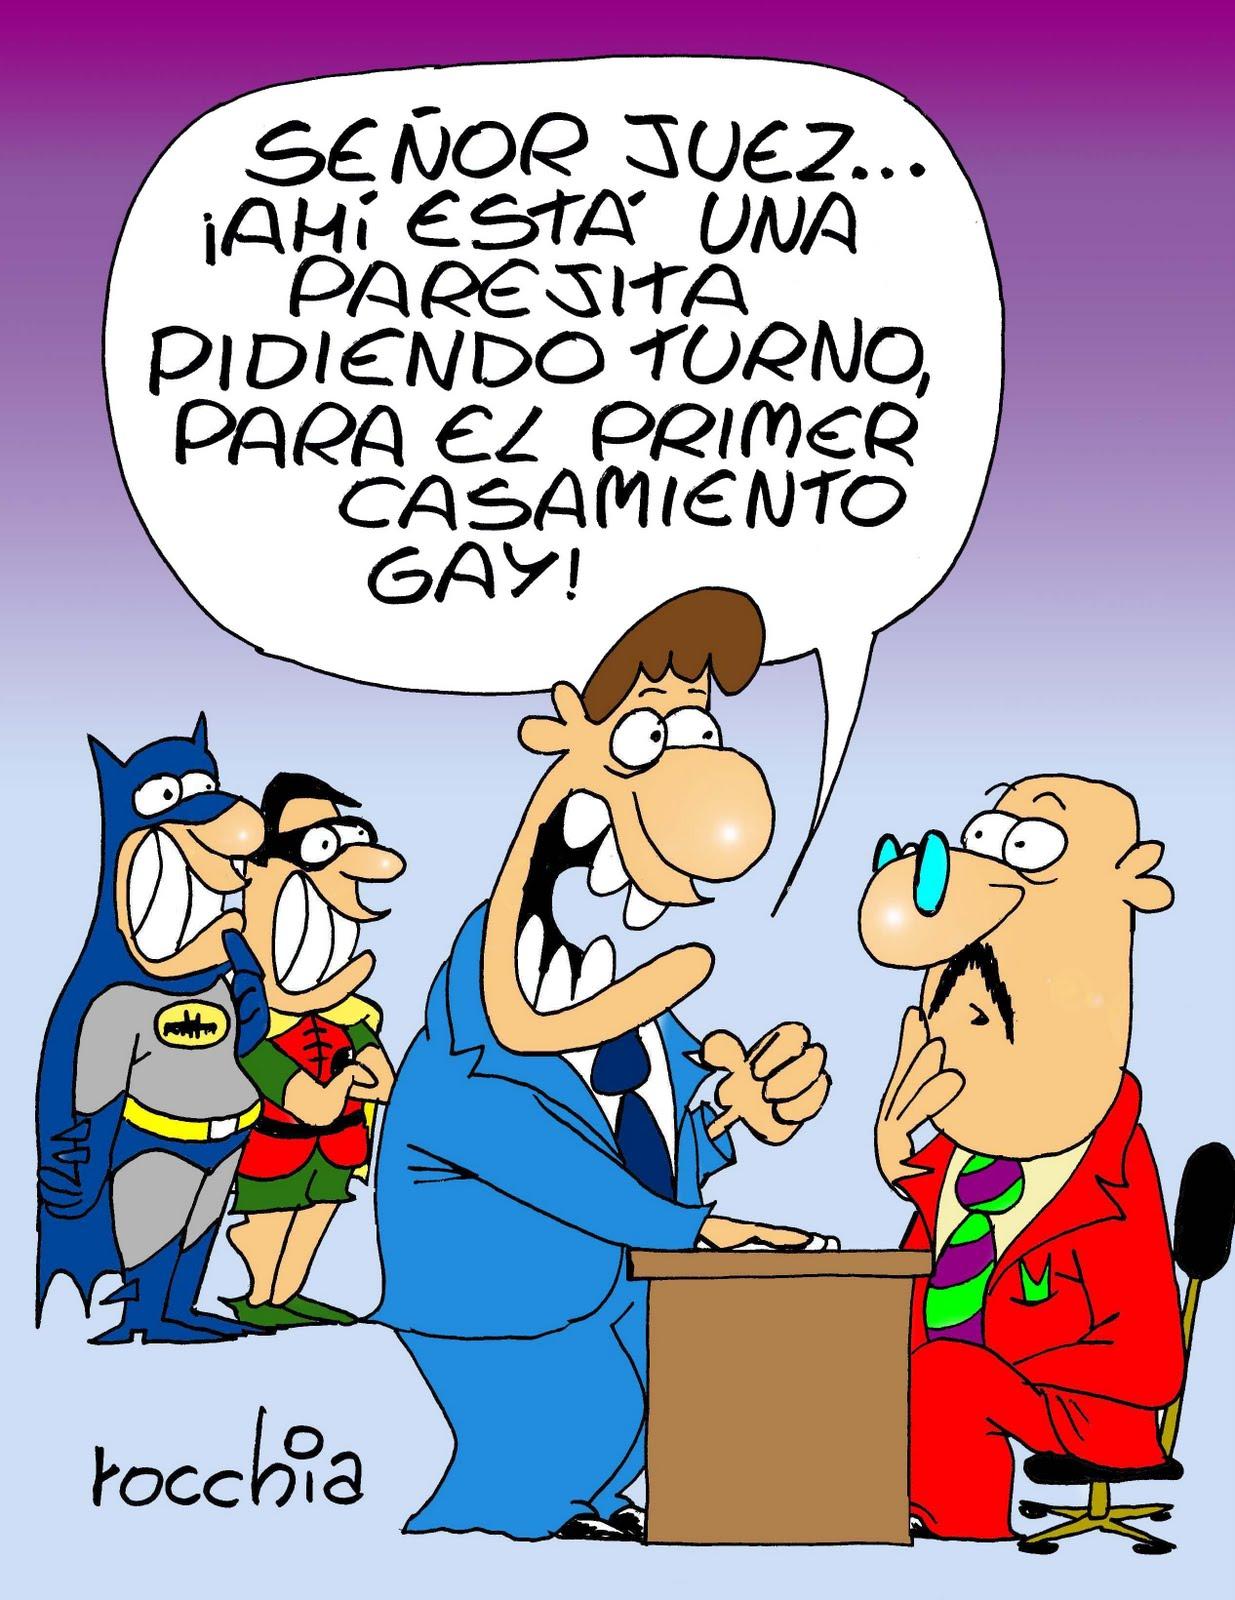 Matrimonio Gay Biblia : El de rocchia matrimonio gay